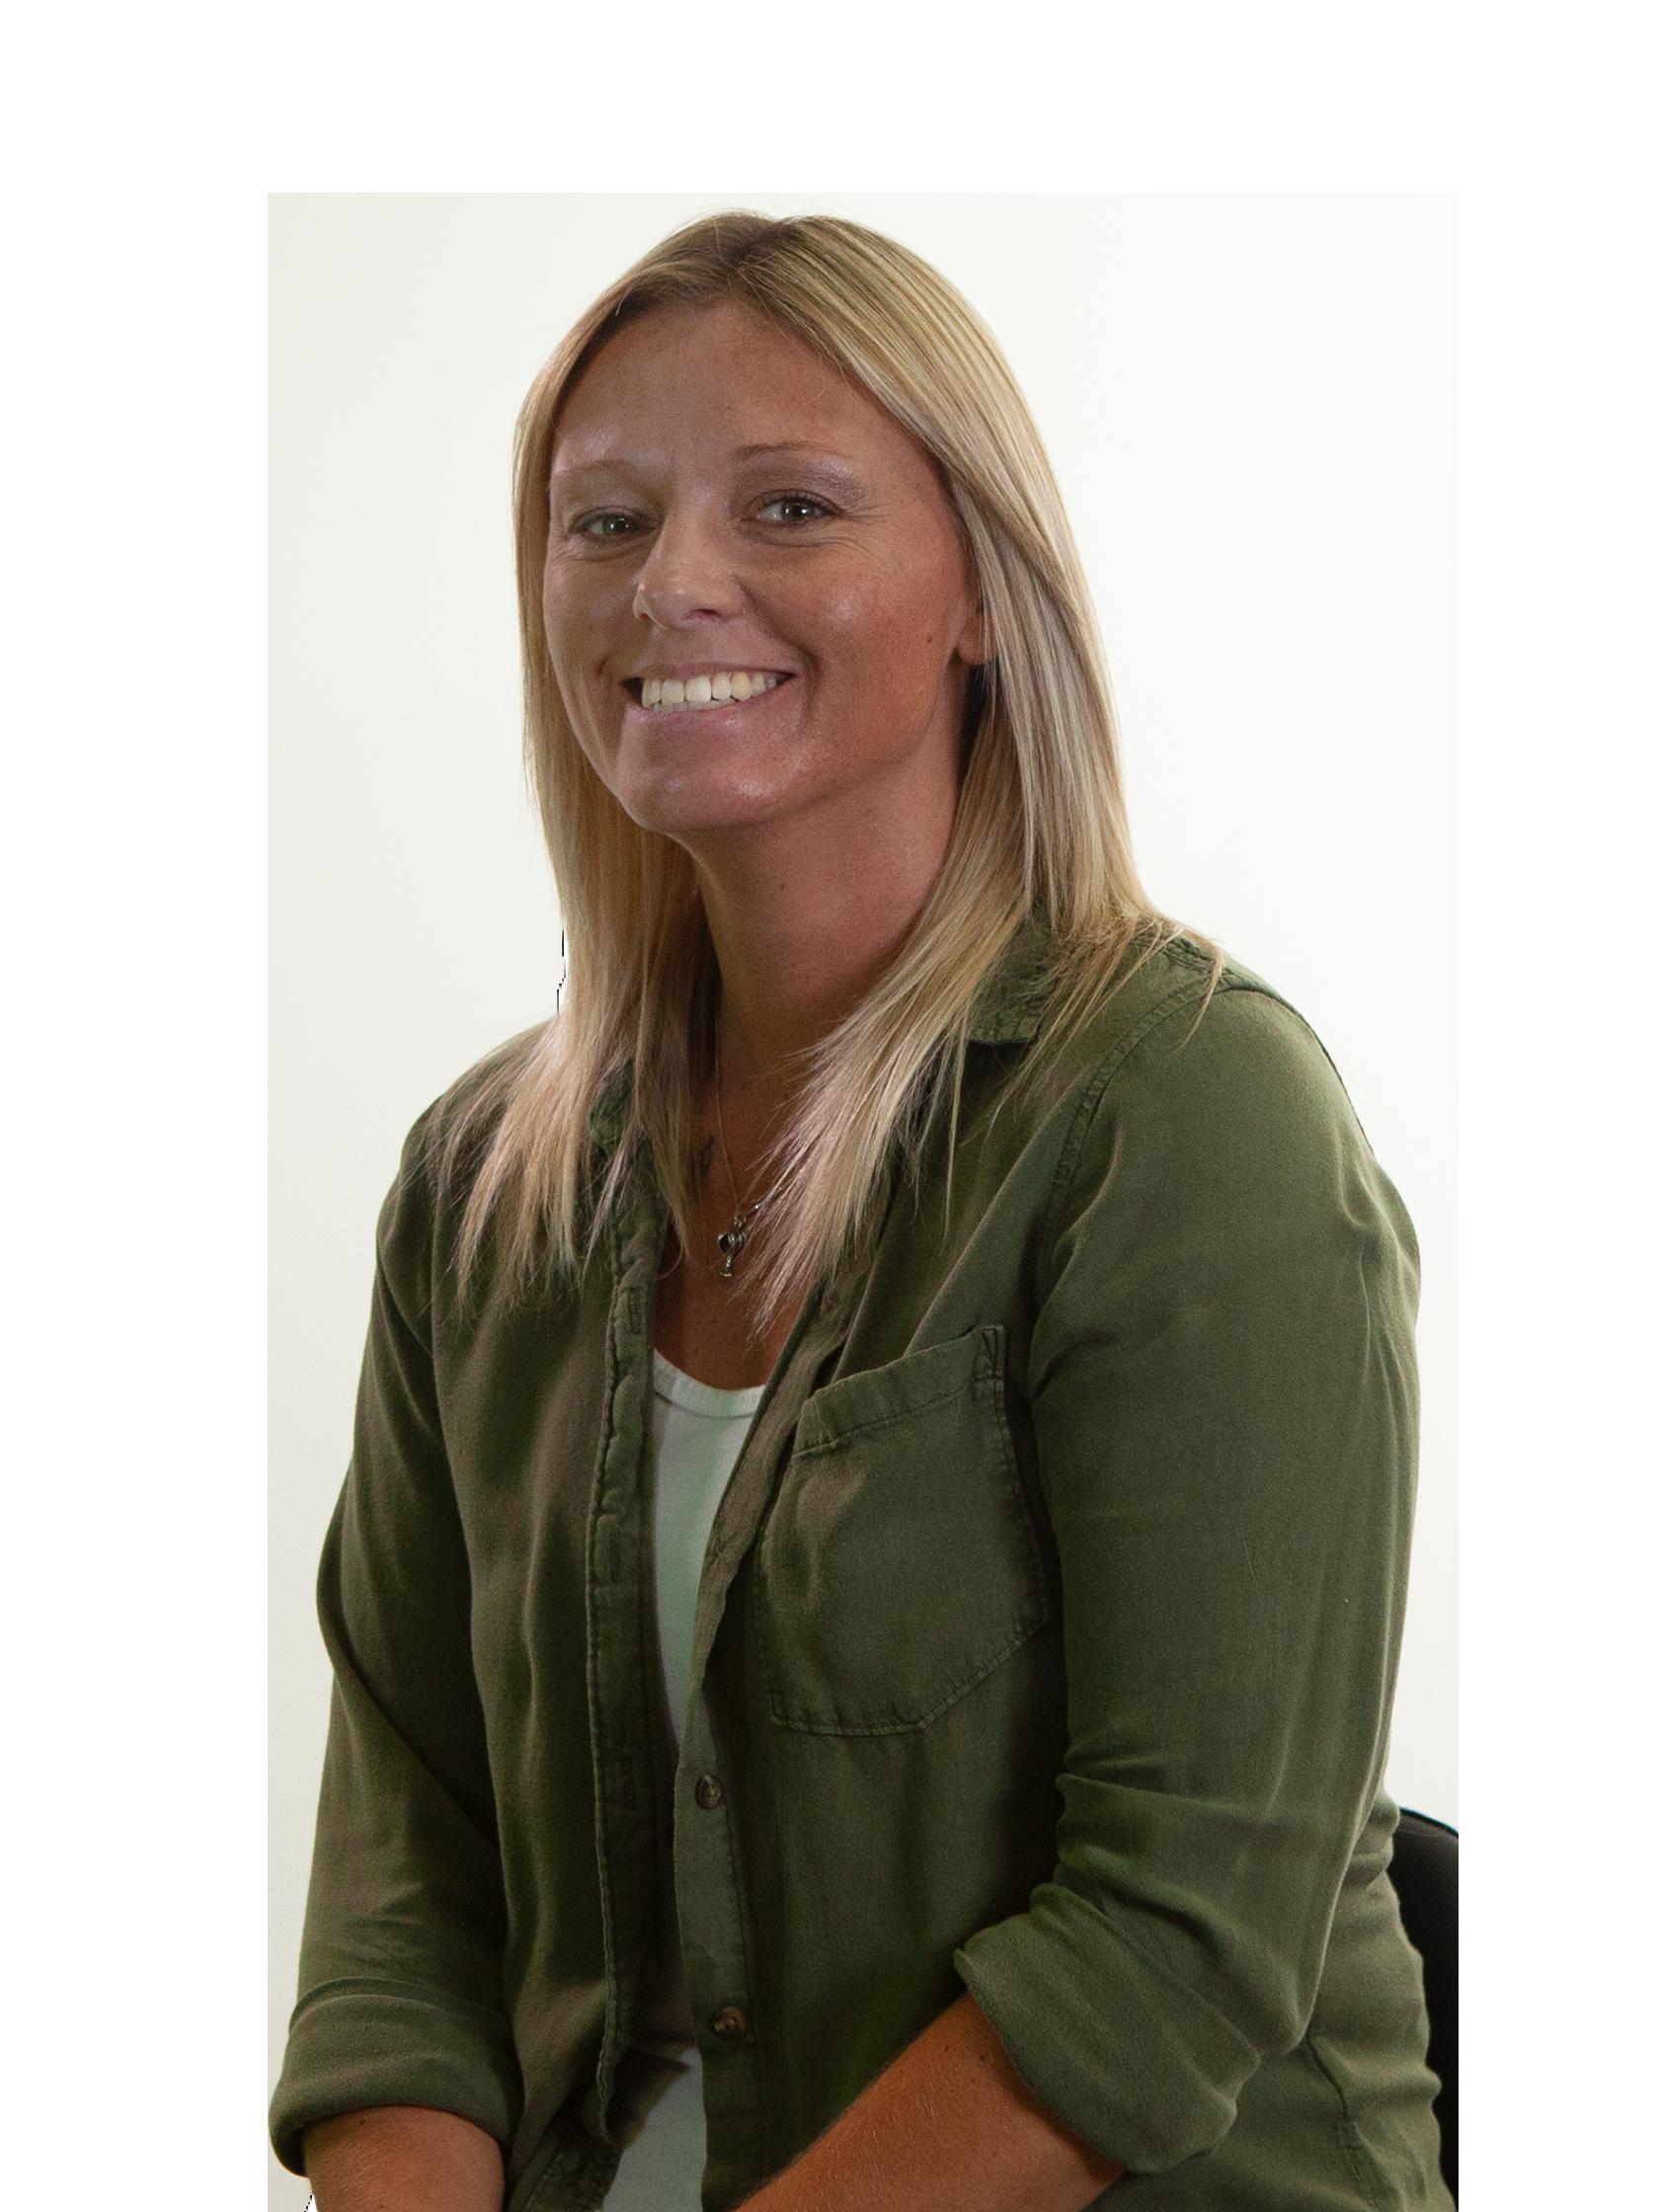 Market Vision Employee - Brenda